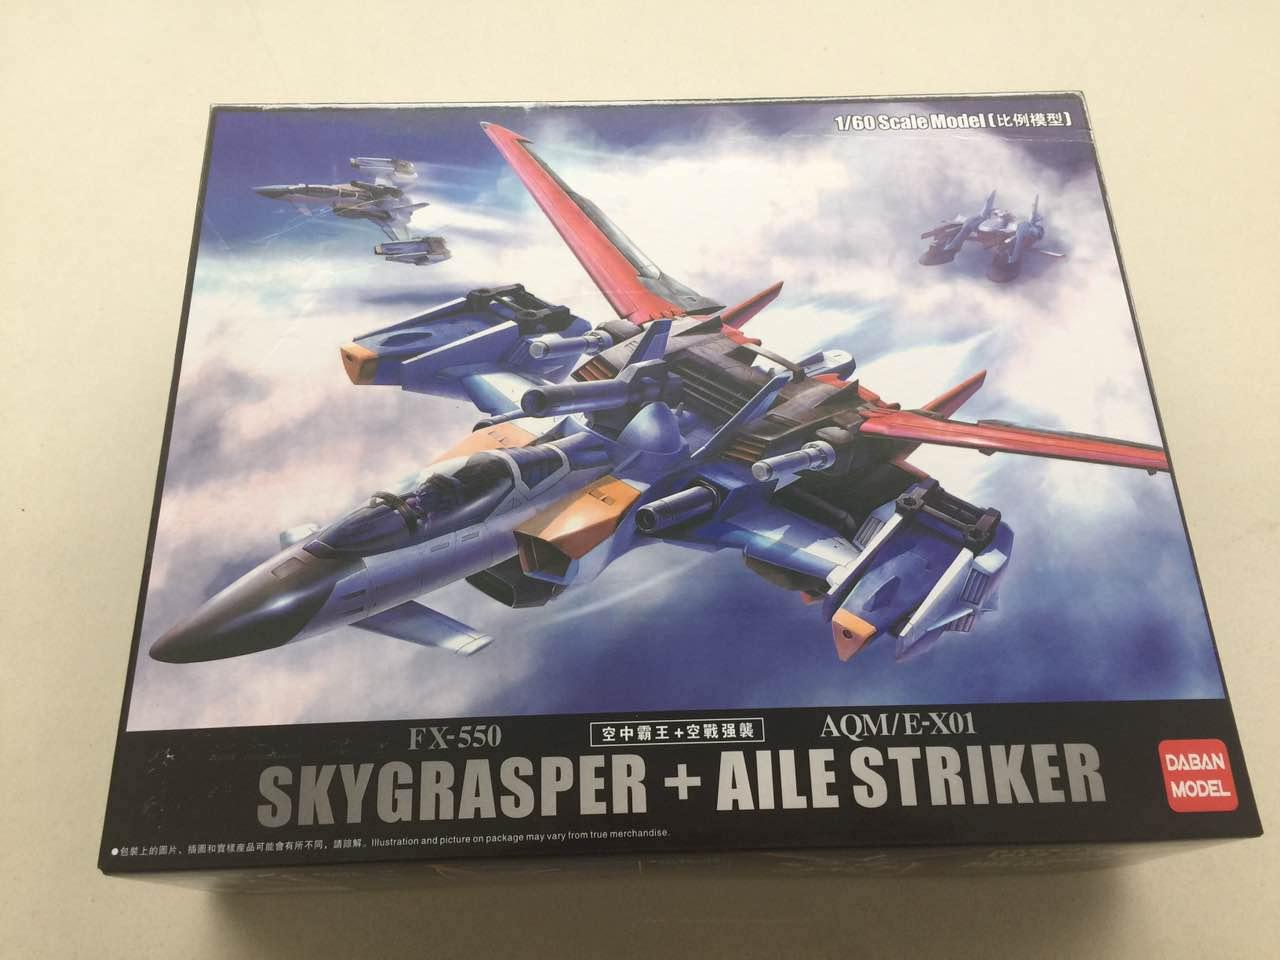 SKYGRASPER+AILE STRIKER DABAN